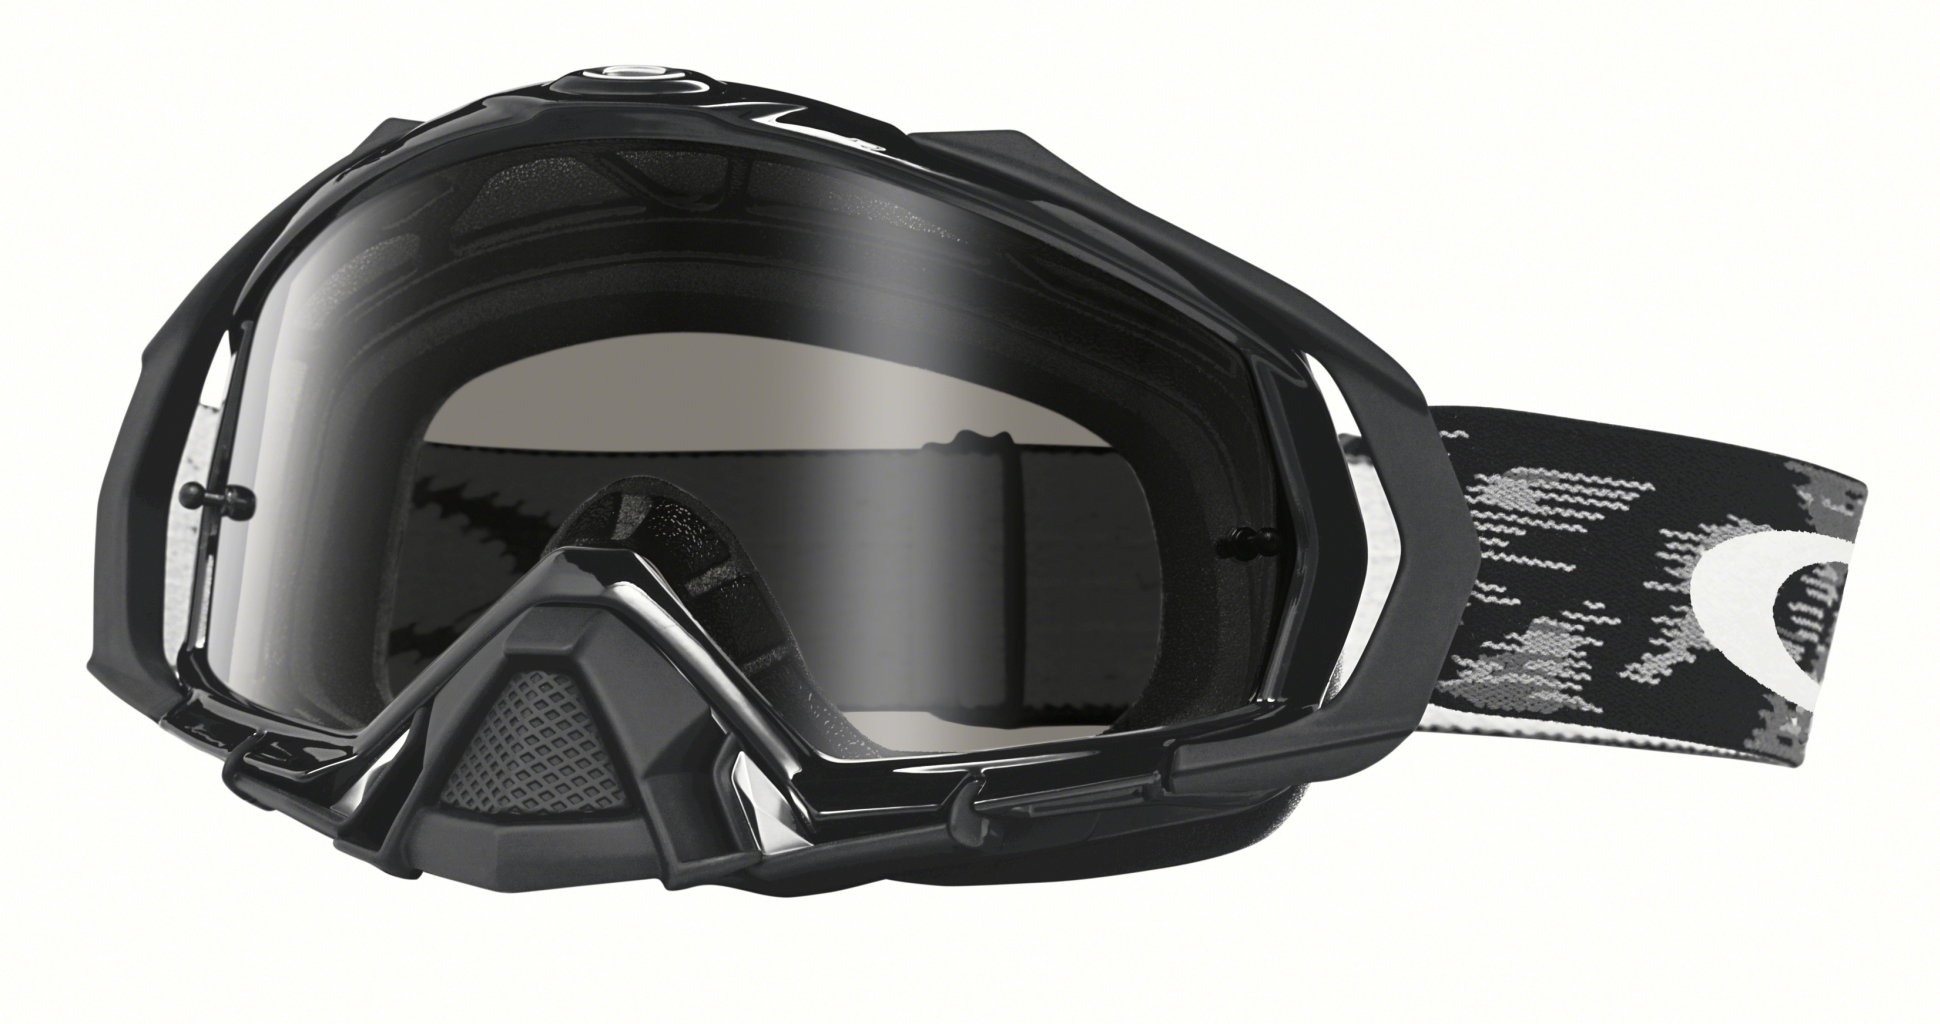 Oakley Mayhem Pro Mx Sand Jet Black w/Dk.Grey-30